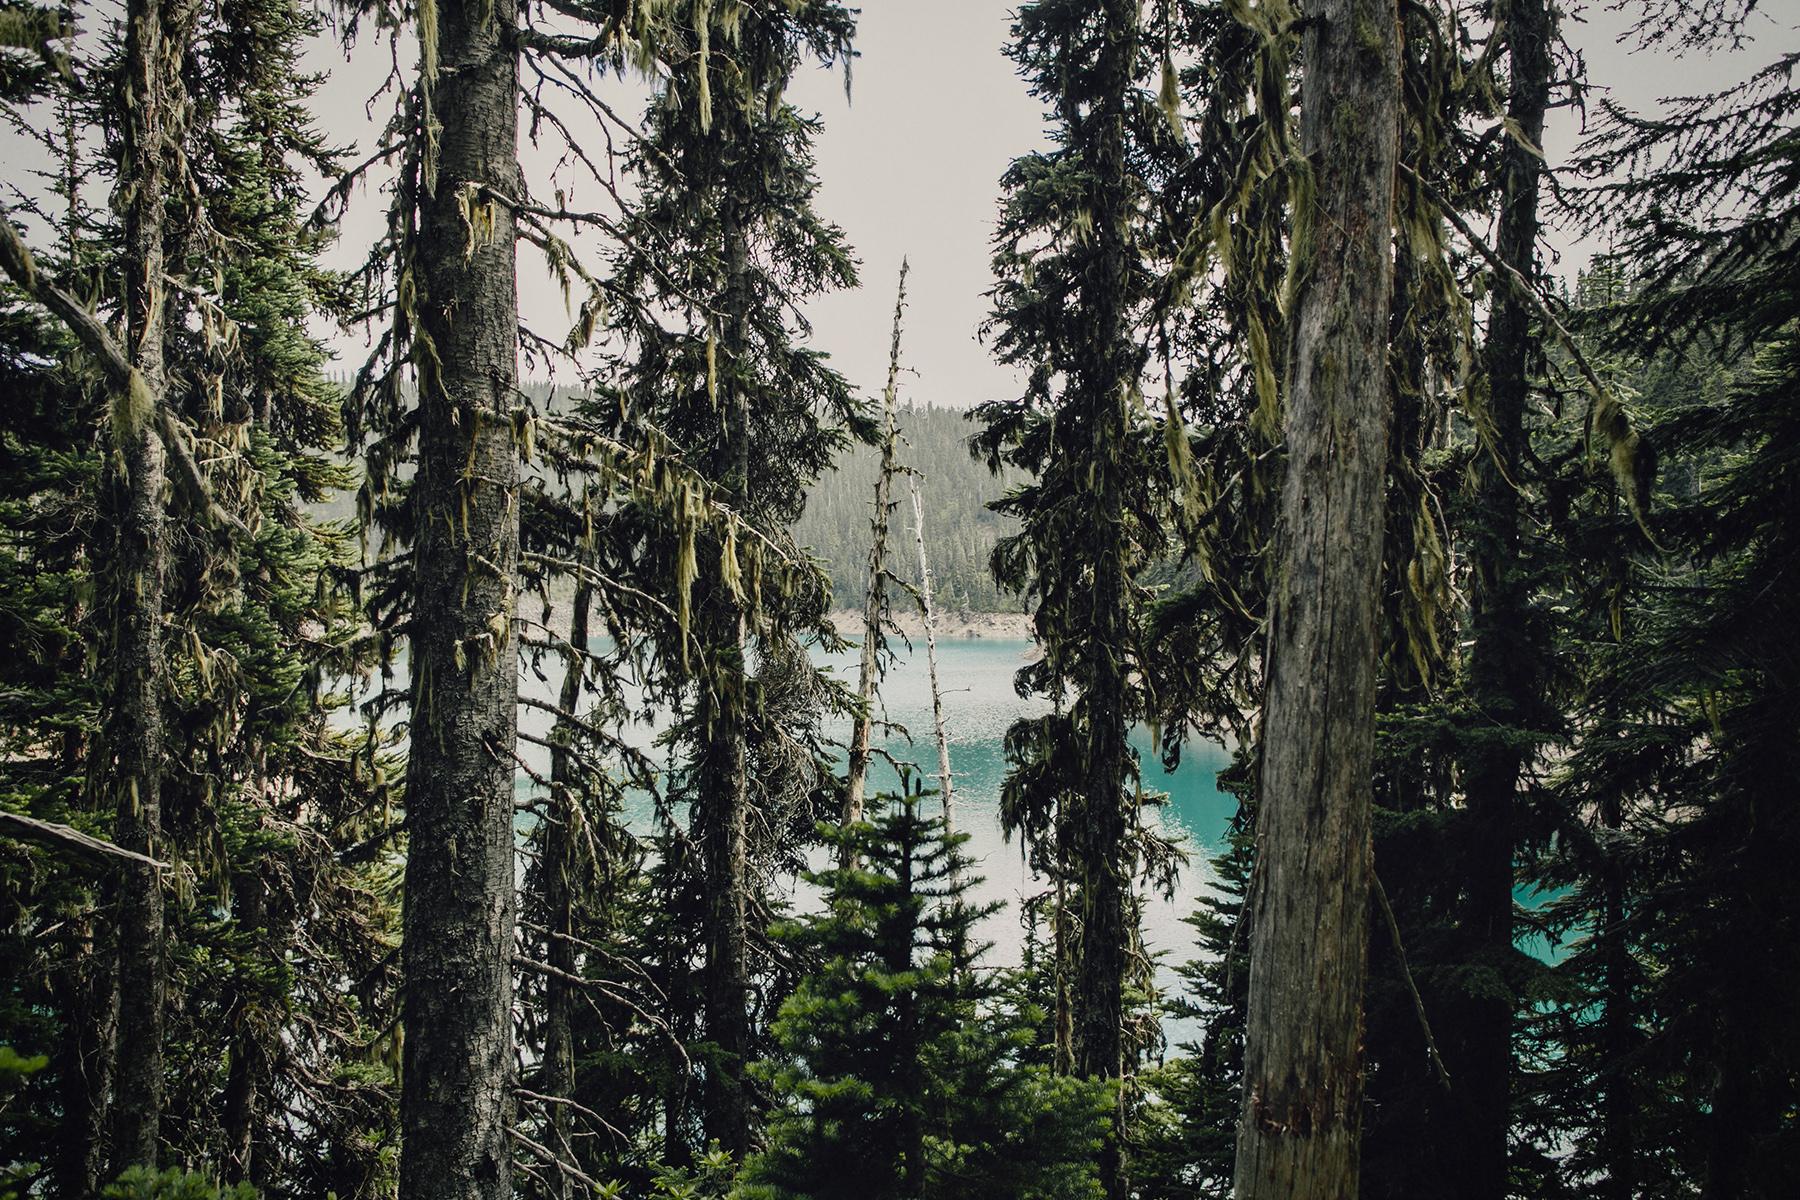 black-tusk-hike-garibaldi-provincial-park-photo-00281.jpg